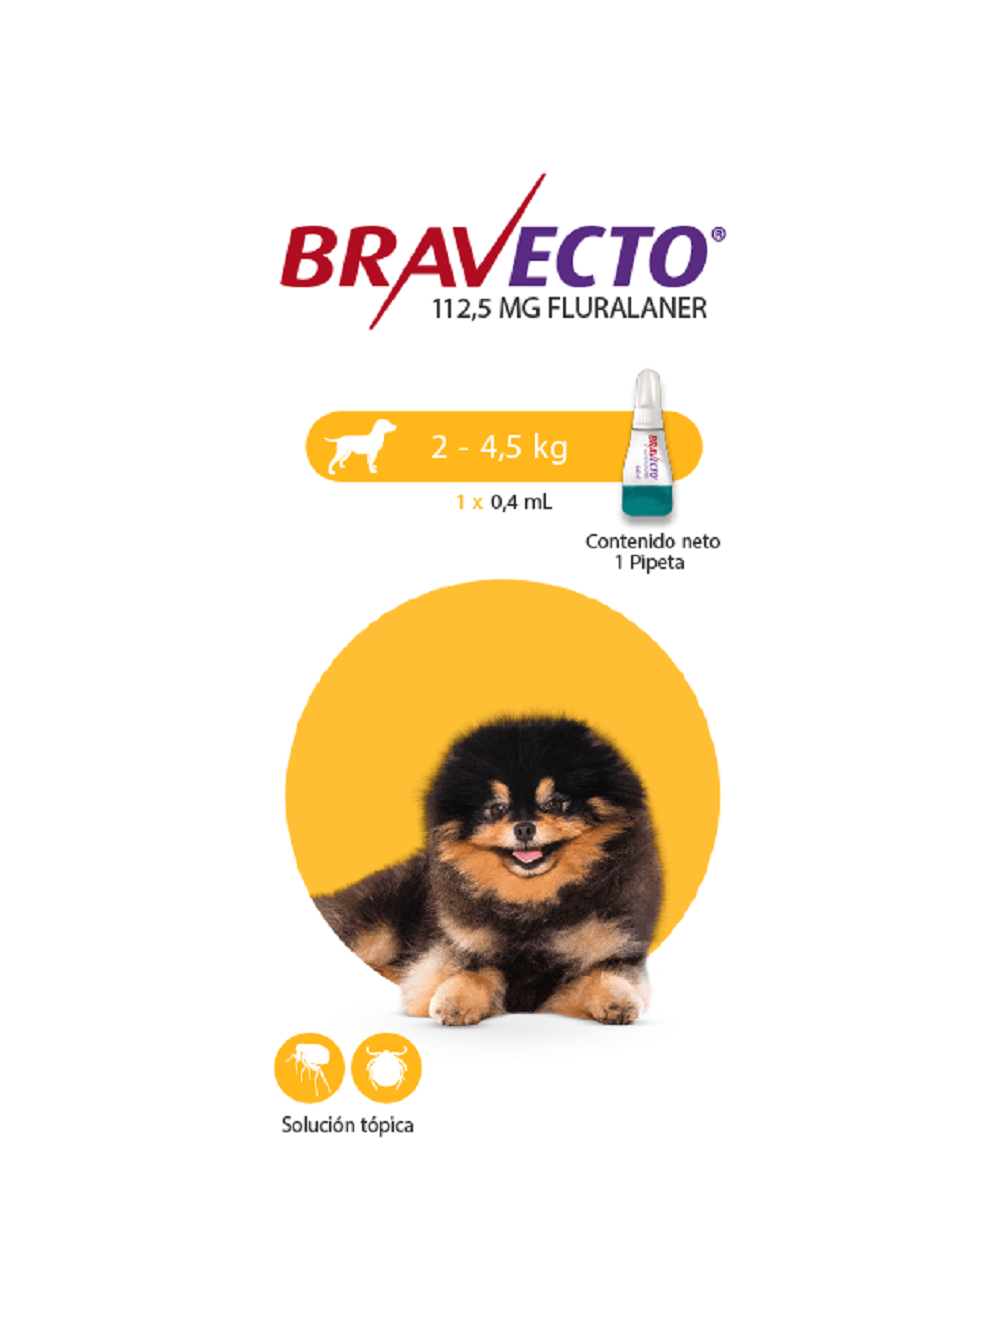 Antipulgas para perros Bravecto Spot on - Ciudaddemascotas